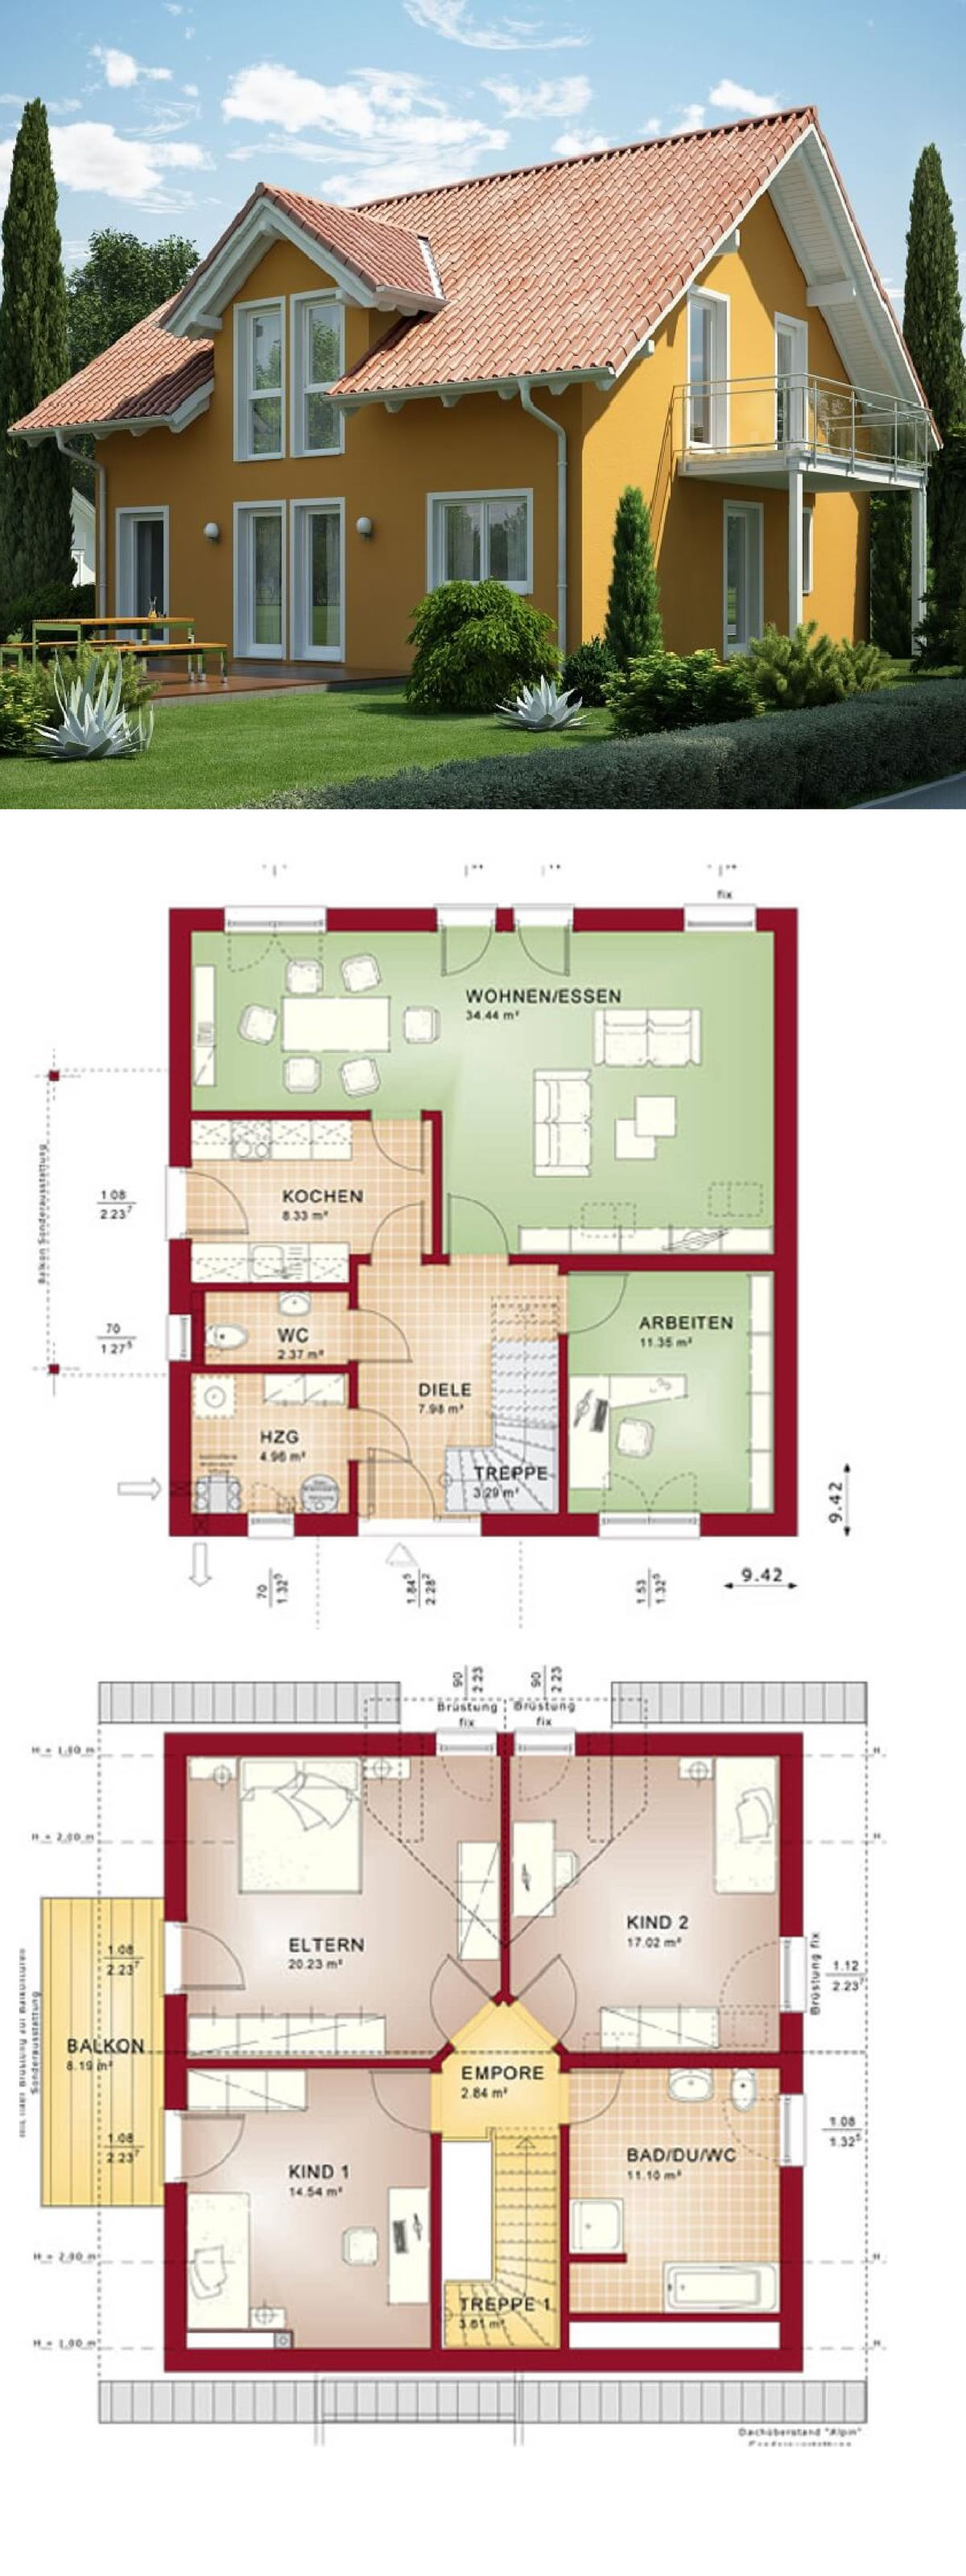 Lovely Einfamilienhaus Mediterraner Stil   Haus Evolution 143 V2 Bien Zenker  Fertighaus Mit Satteldach Moderner Grundriss Separate